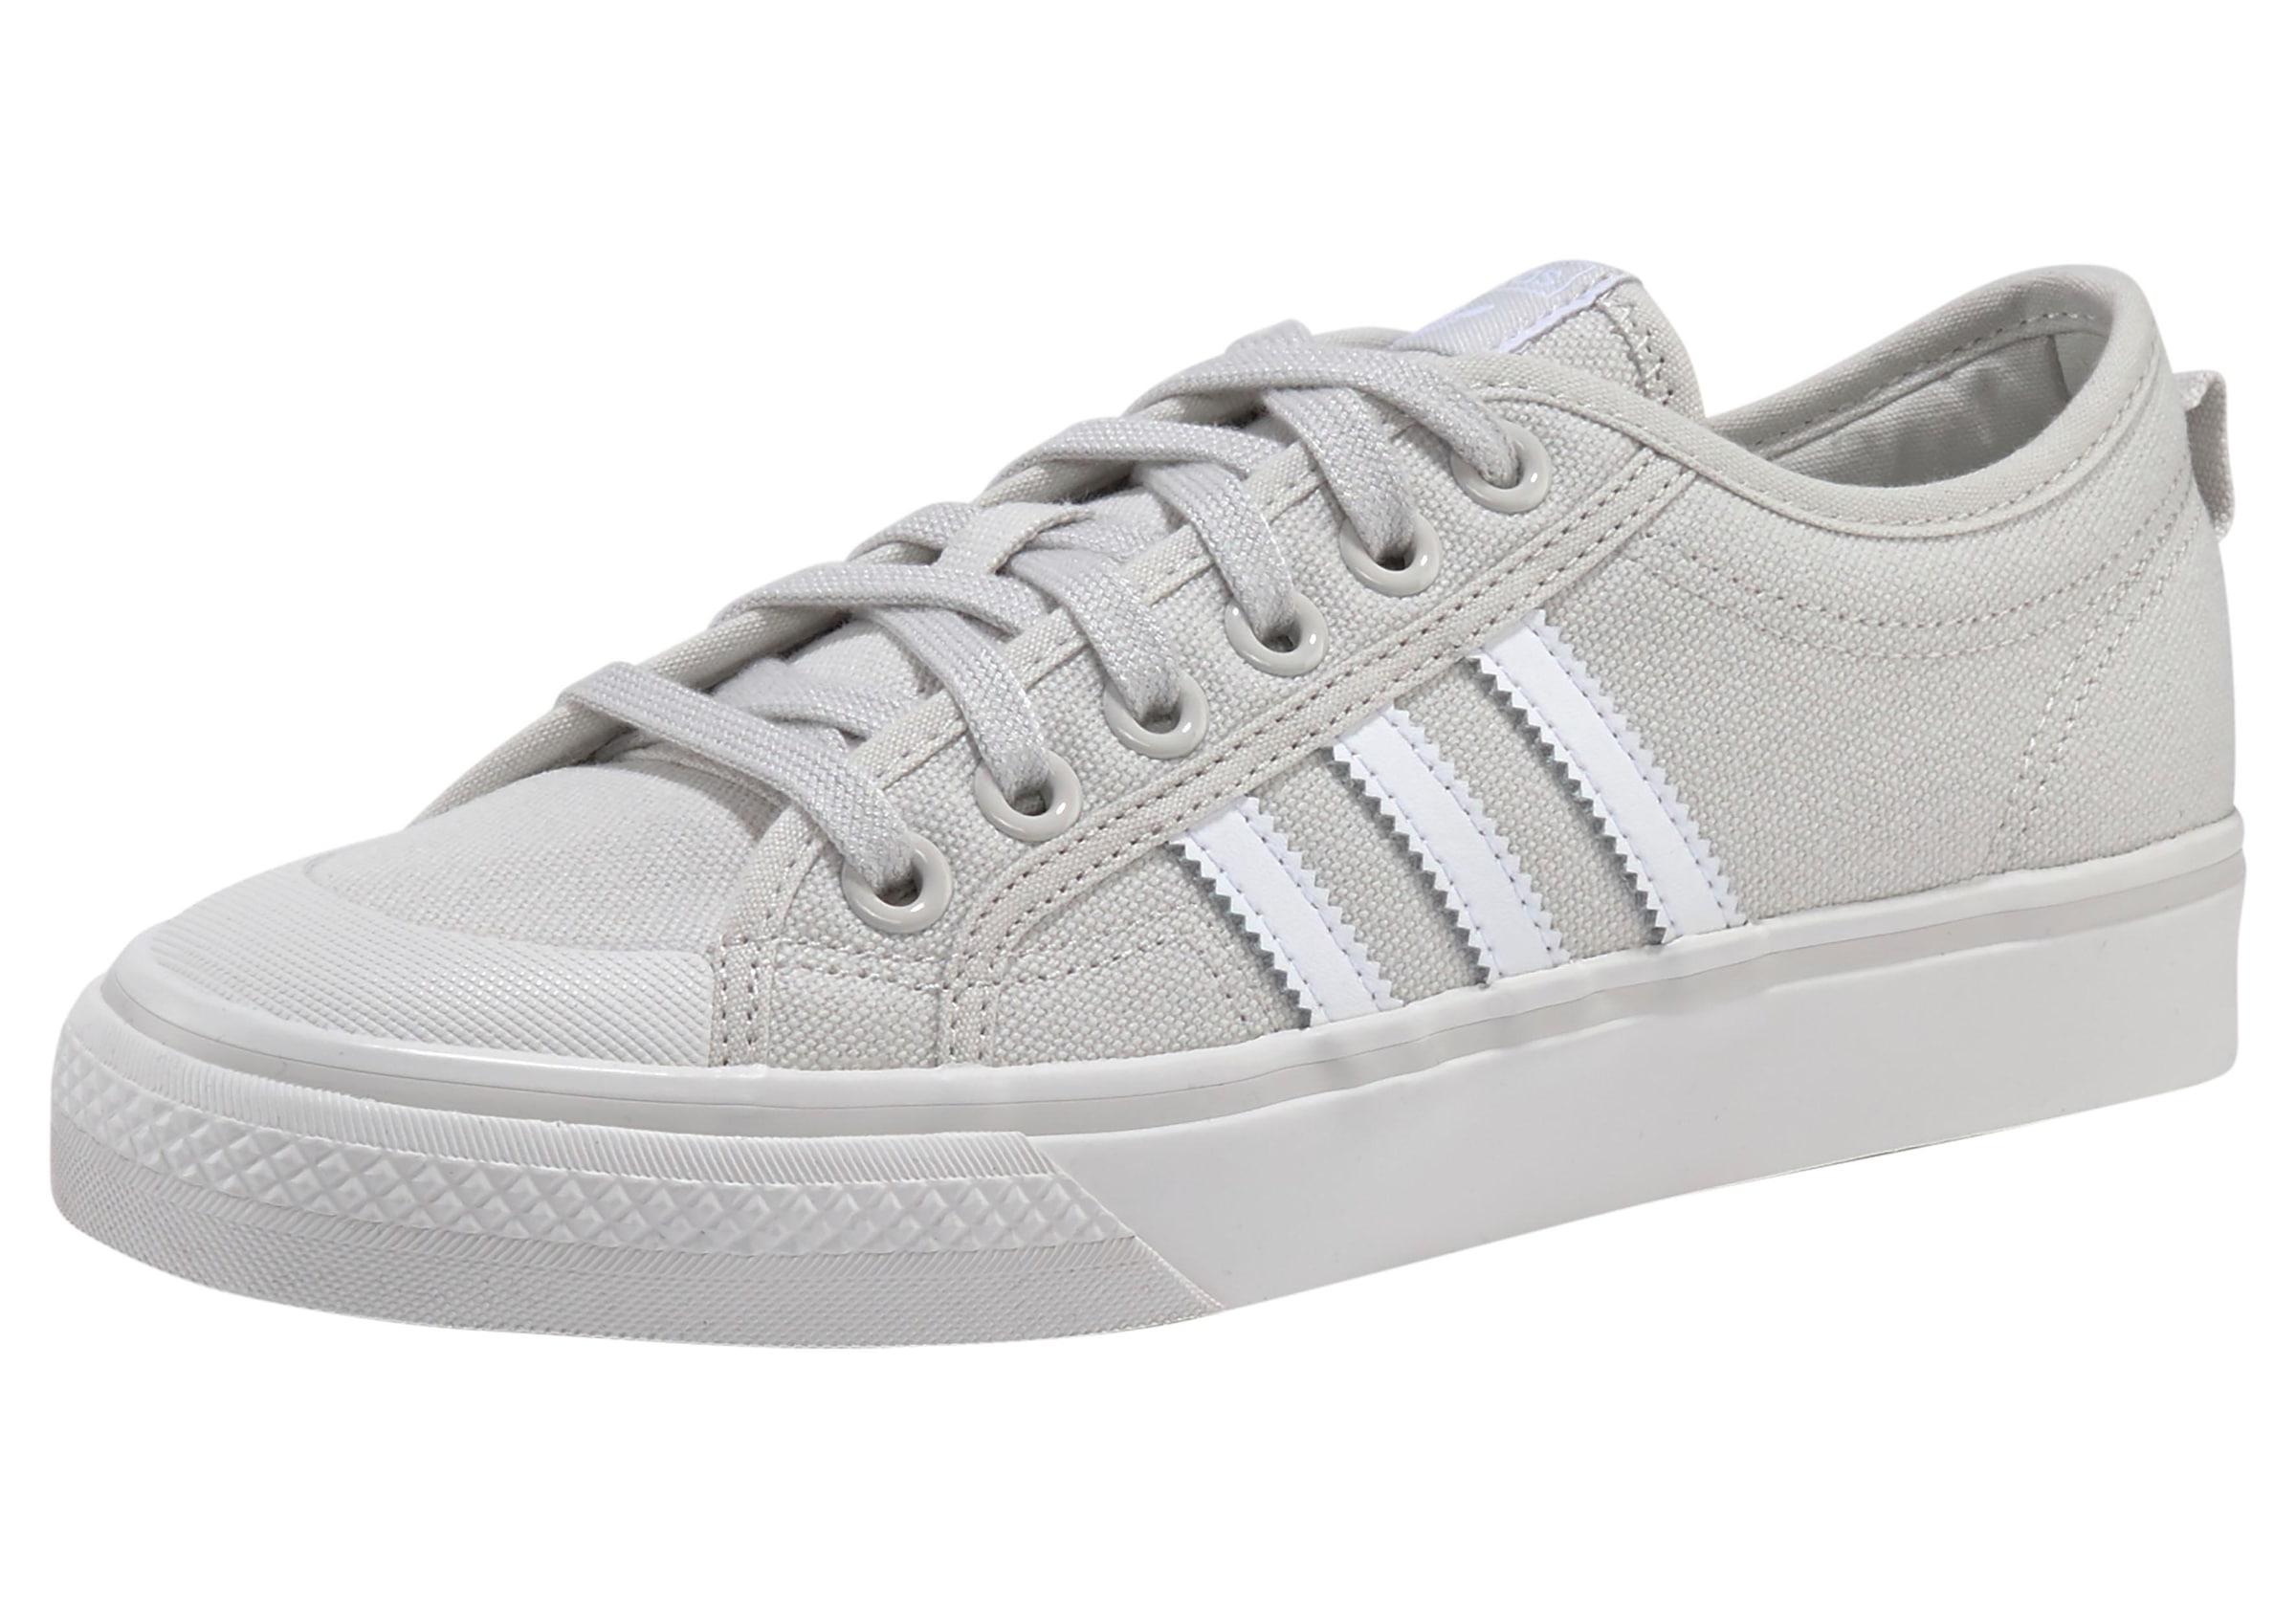 Neu Damenschuhe Halbschuhe Turnschuhe Schuhe adidas Nizza W